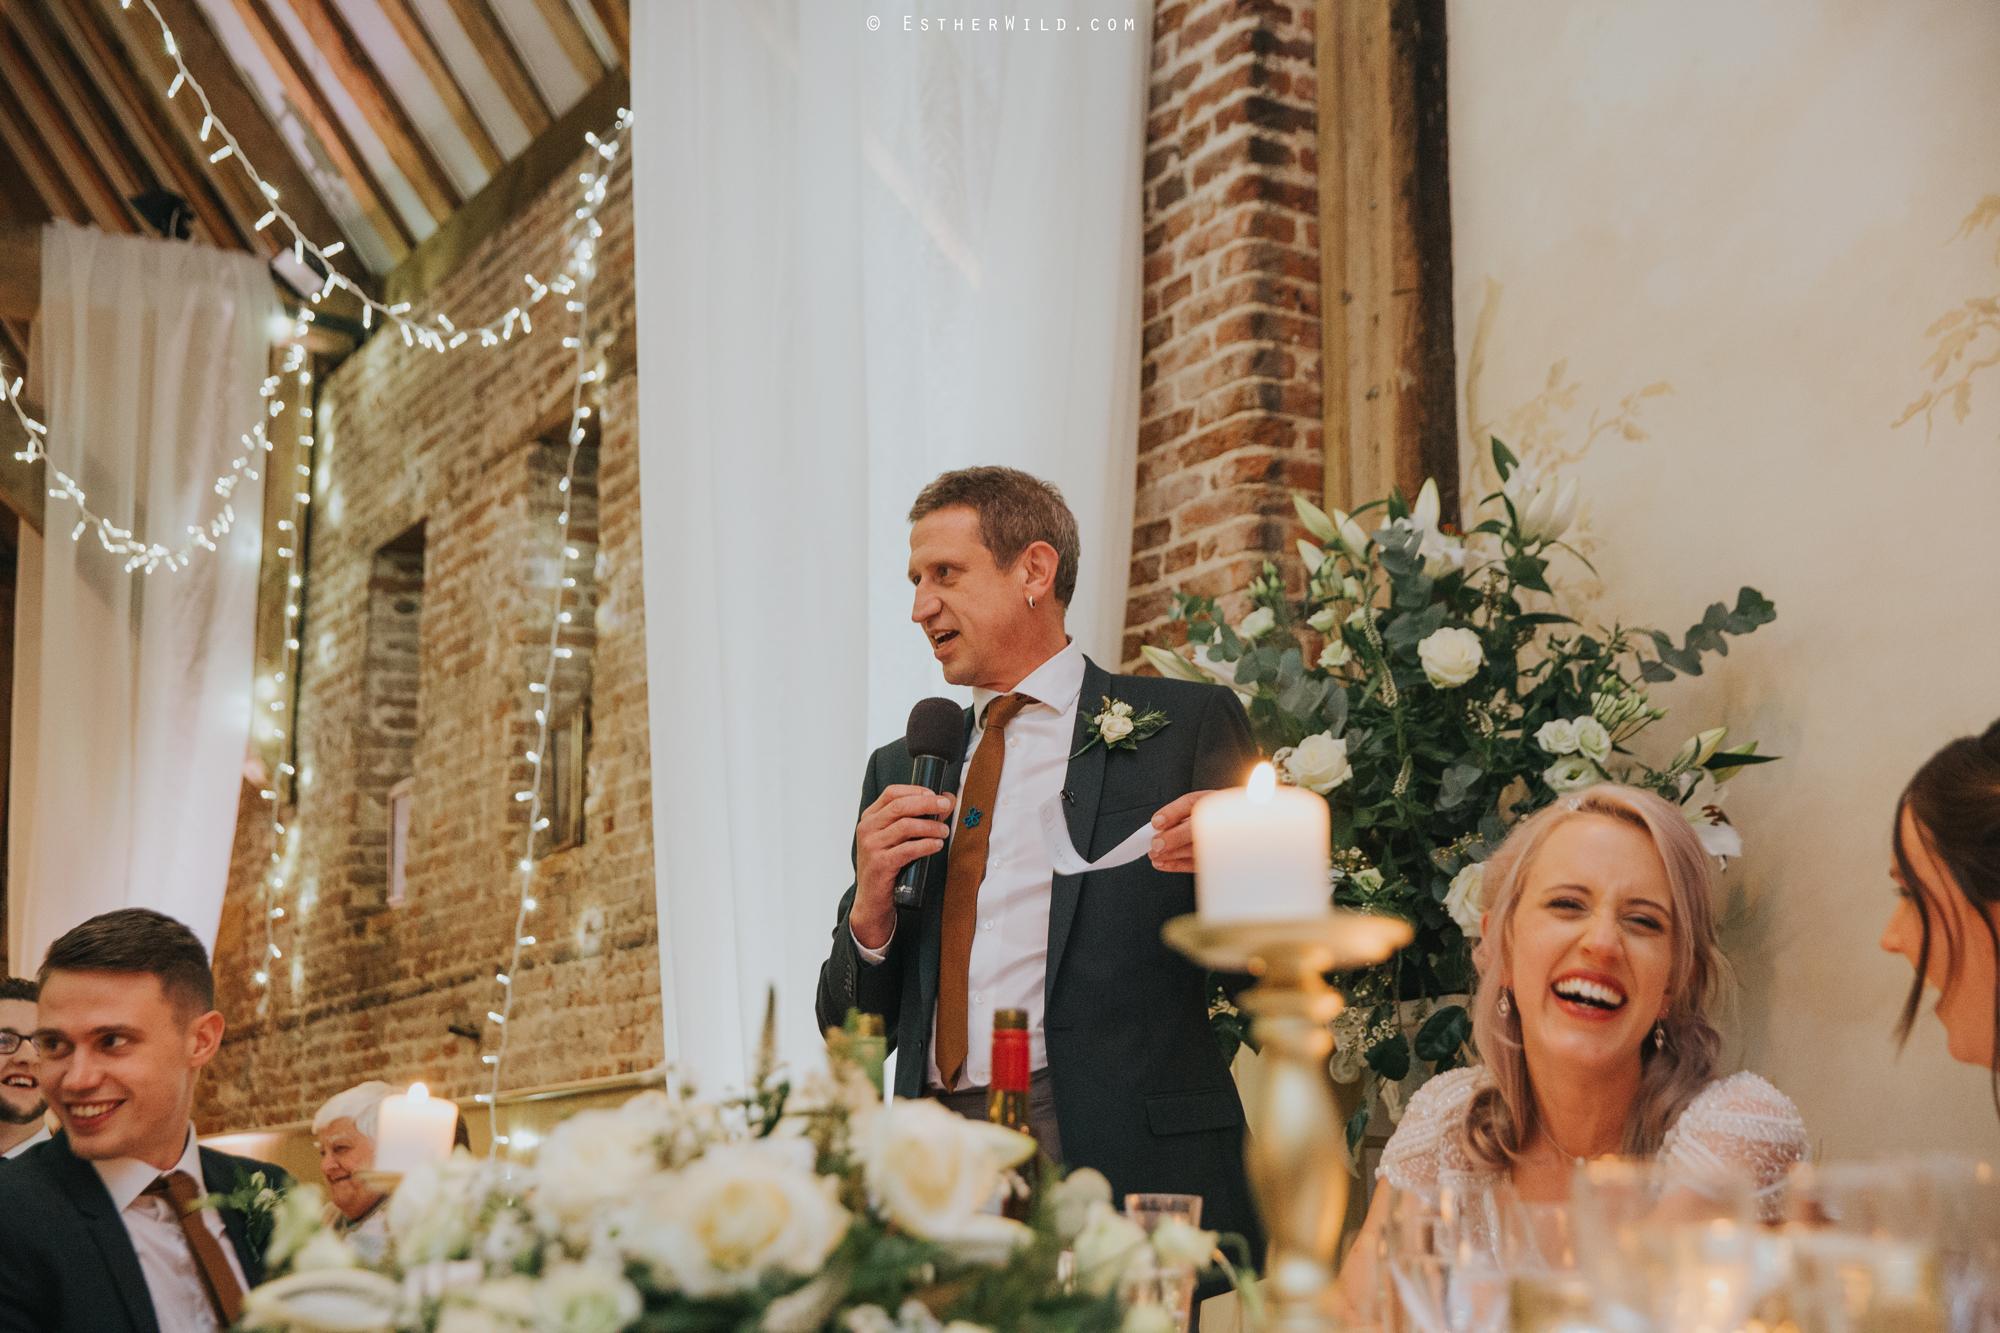 Elms_Barn_Weddings_Suffolk_Photographer_Copyright_Esther_Wild_IMG_2570.jpg